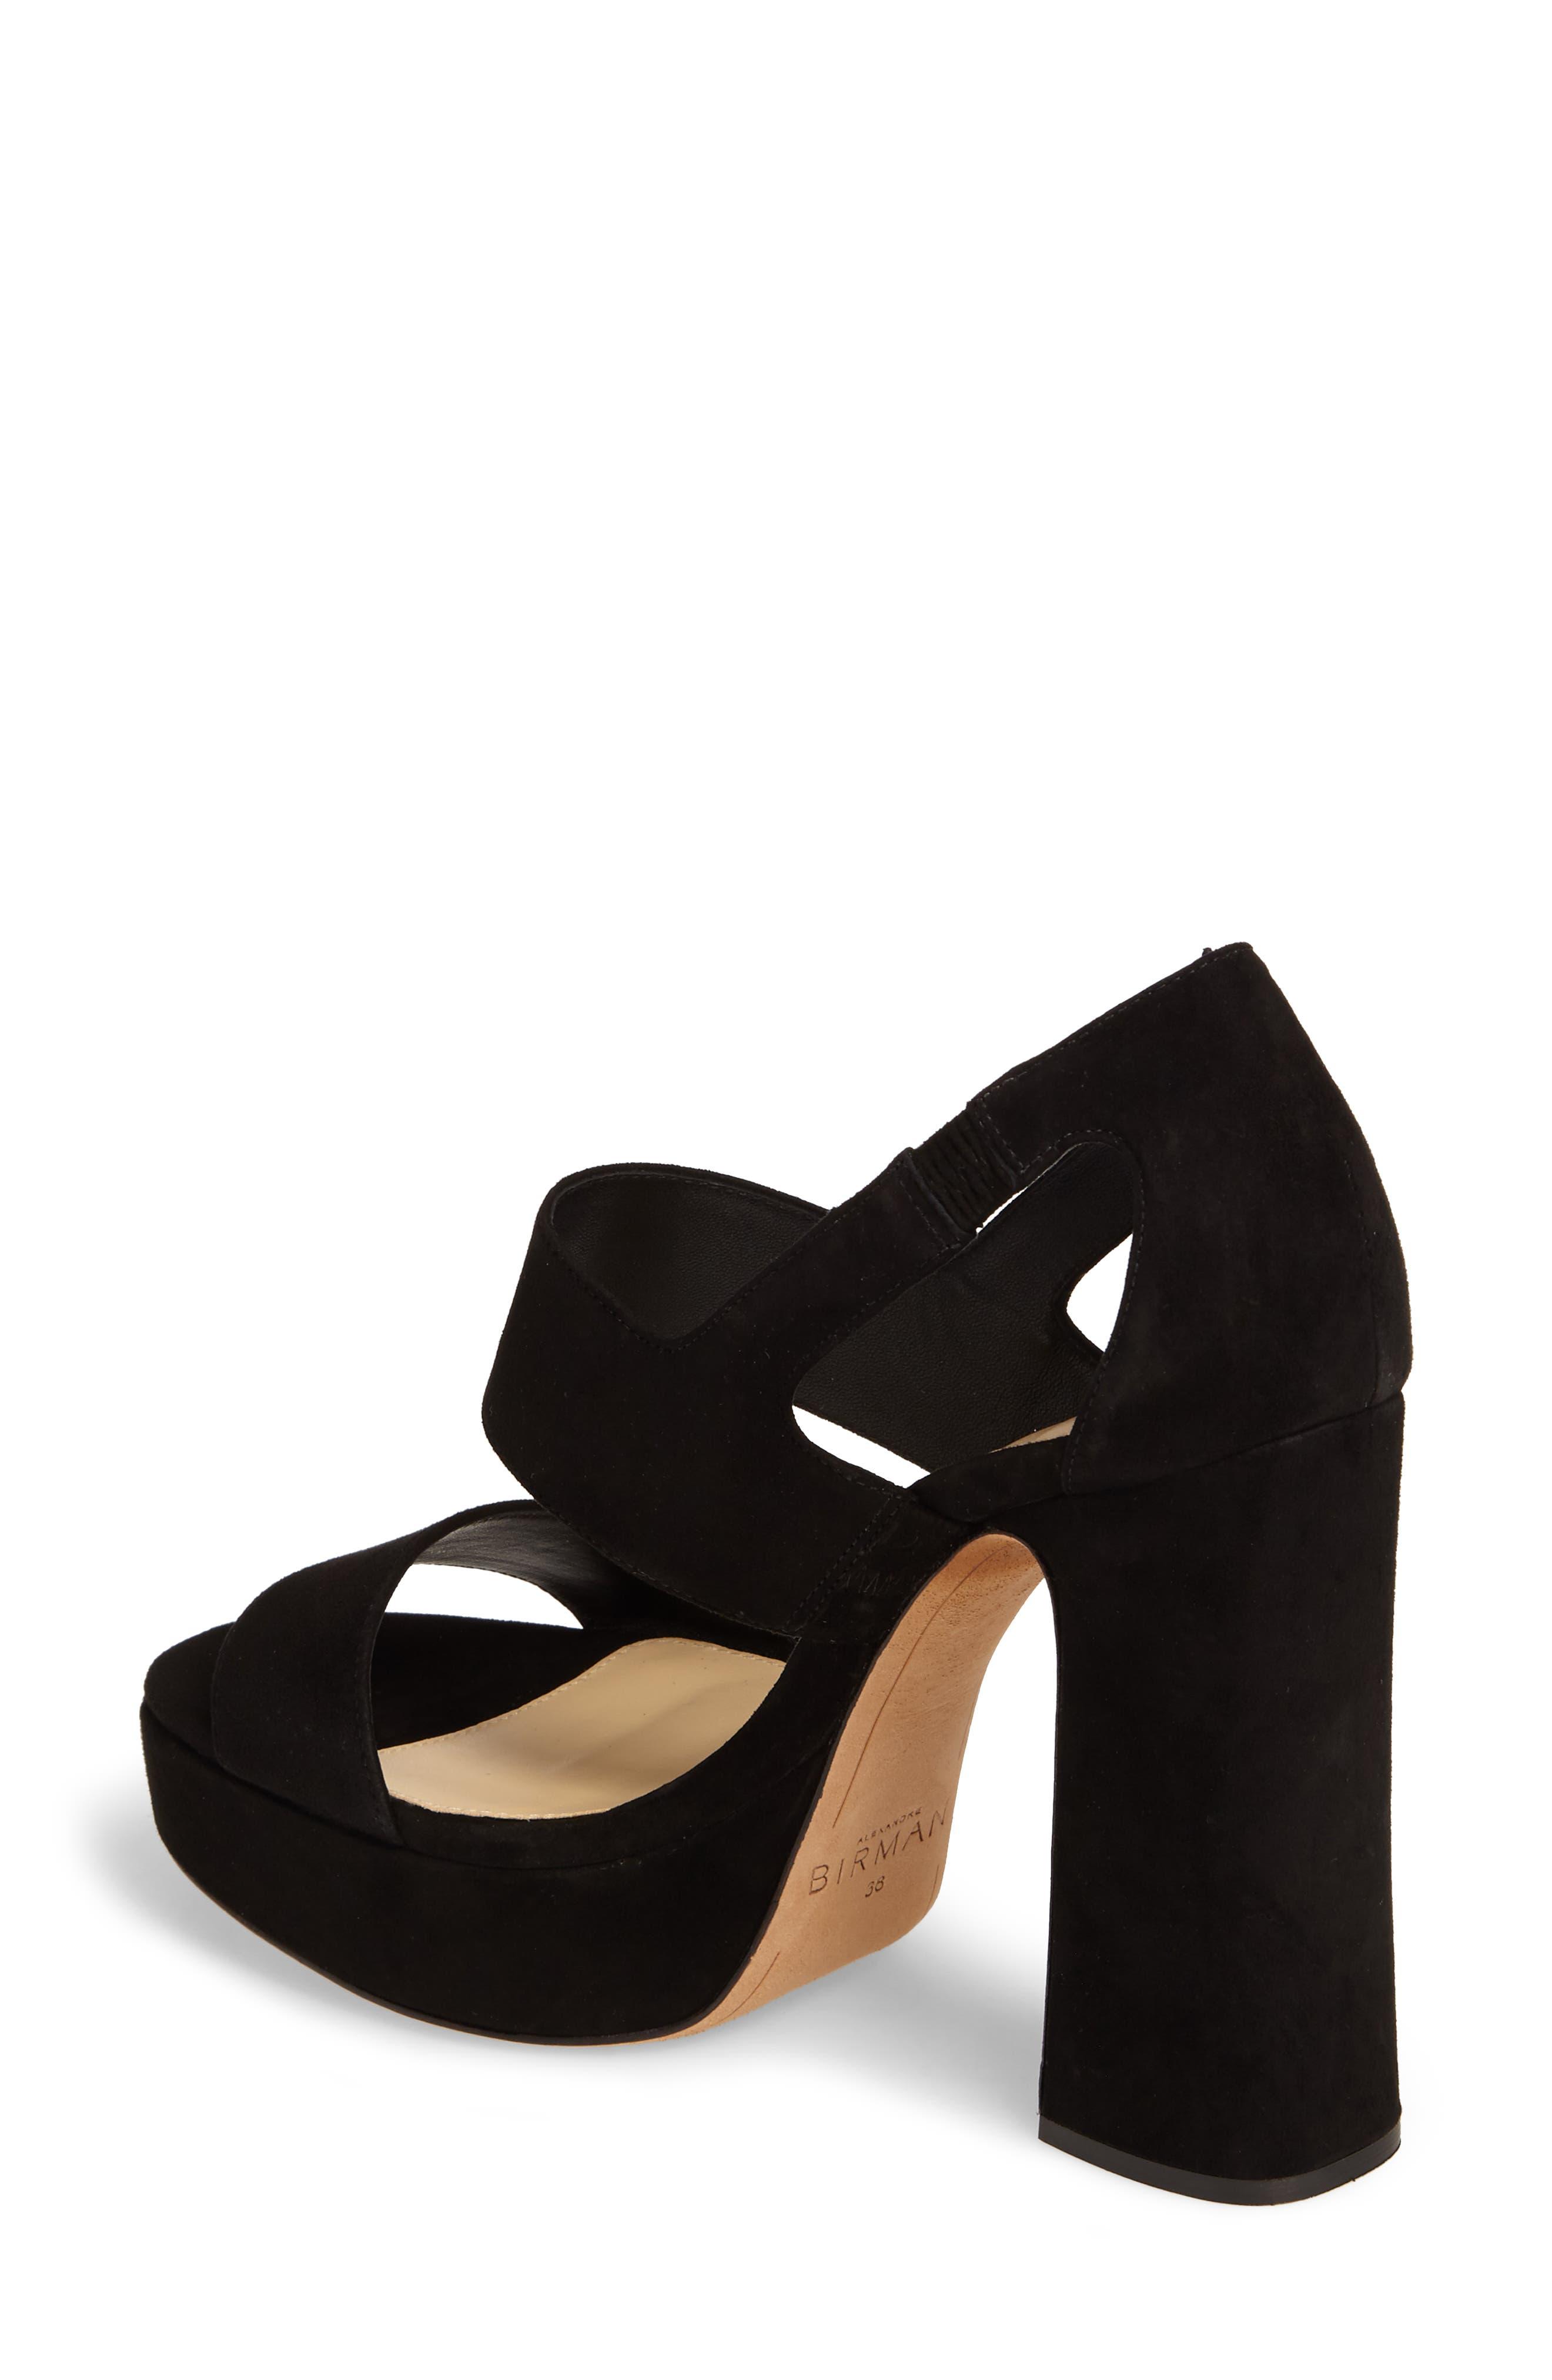 Elouise Platform Sandal,                             Alternate thumbnail 2, color,                             Black